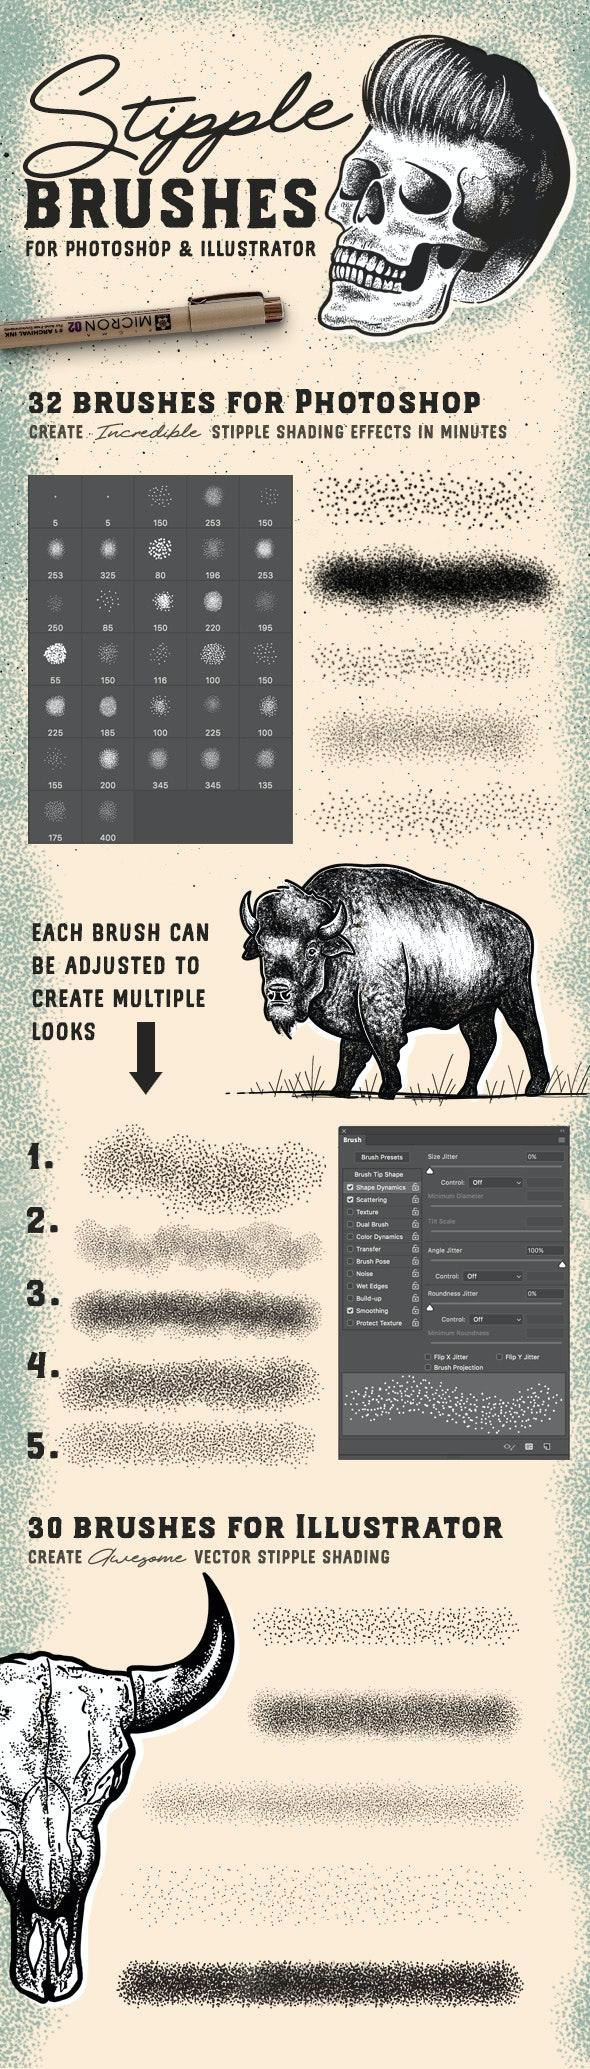 Stipple Brush Set for Photoshop and Illustrator - Photoshop Add-ons